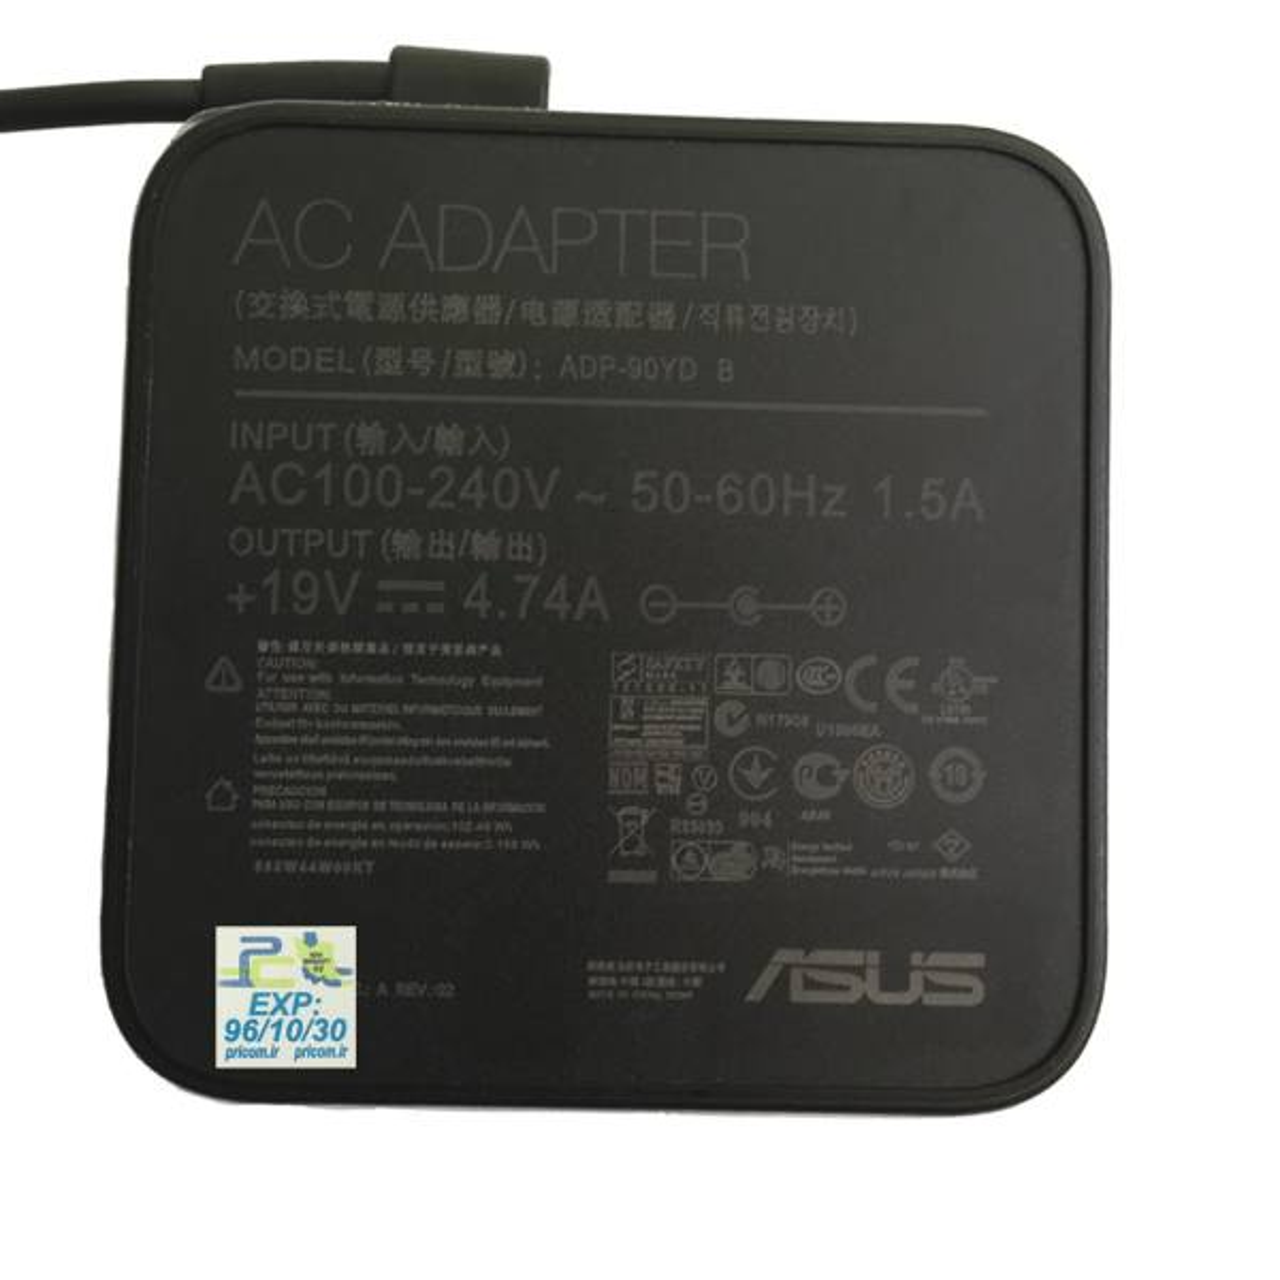 شارژر لپ تاپ 19 ولت 4.7 آمپر ایسوس مدل مربع